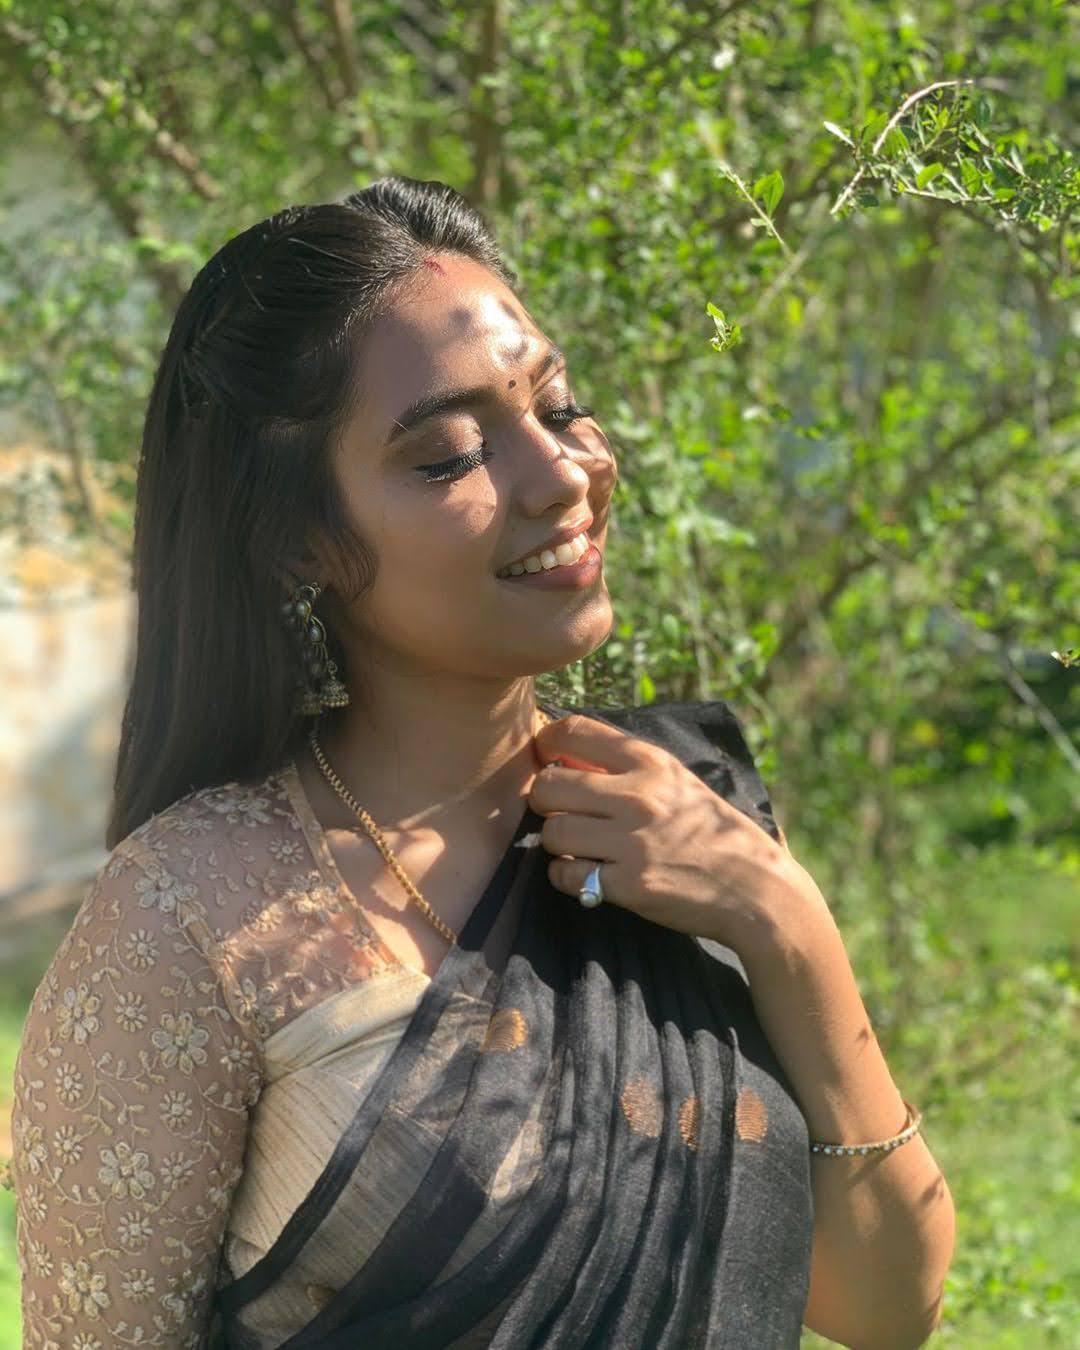 pavithra-janani-64693